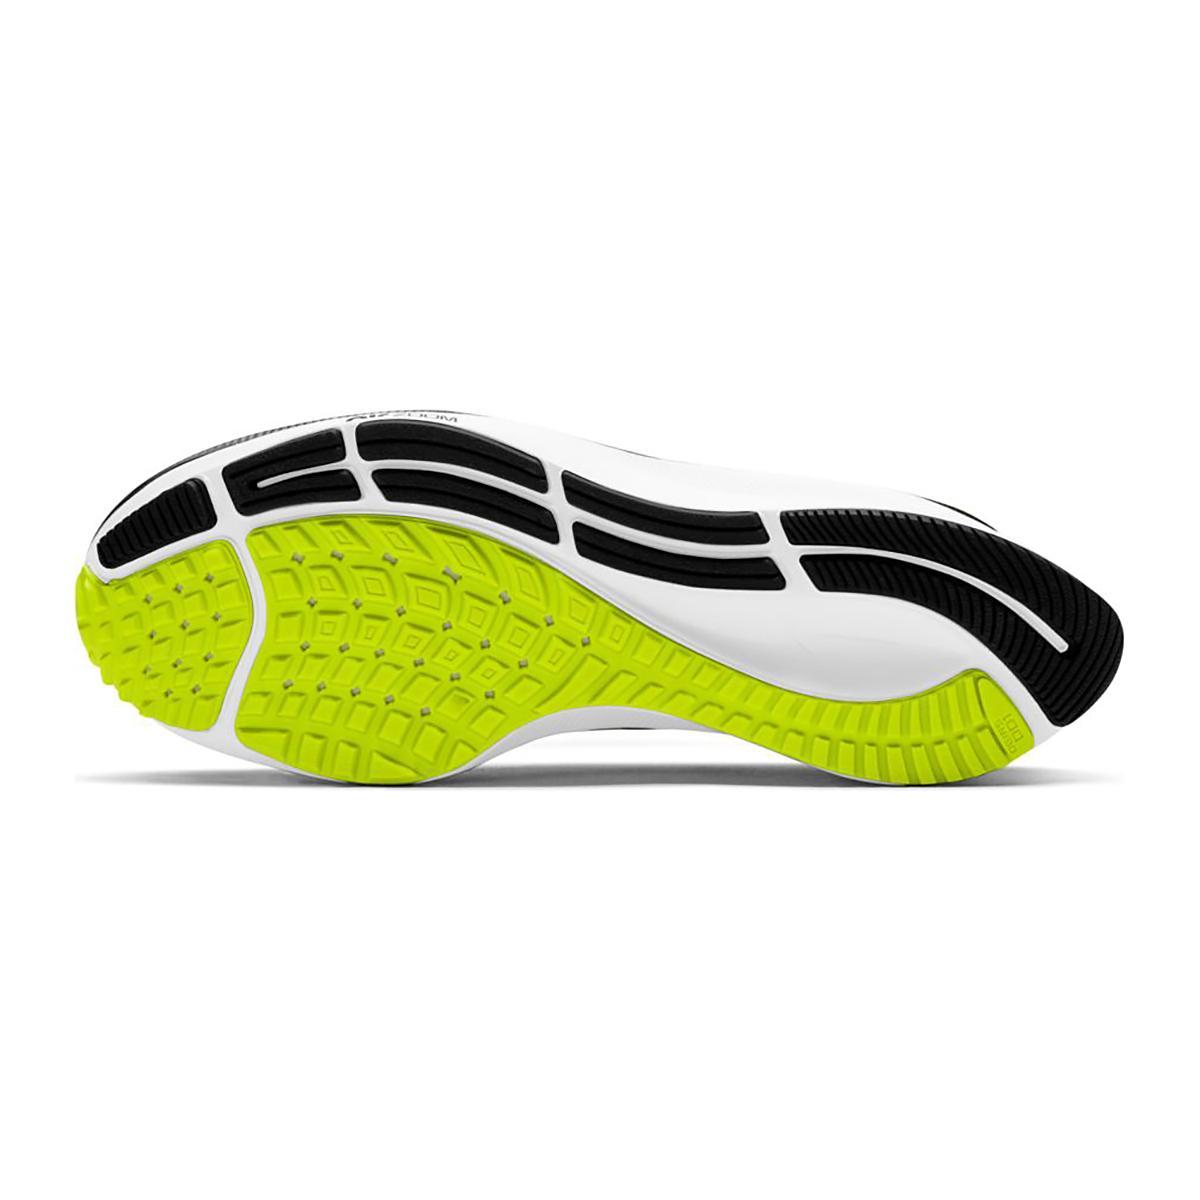 Women's Nike Nike Air Zoom Pegasus 37 Running Shoe - Color: Black/Anthracite/Dark Raisin/White - Size: 5 - Width: Regular, Black/Anthracite/Dark Raisin/White, large, image 3